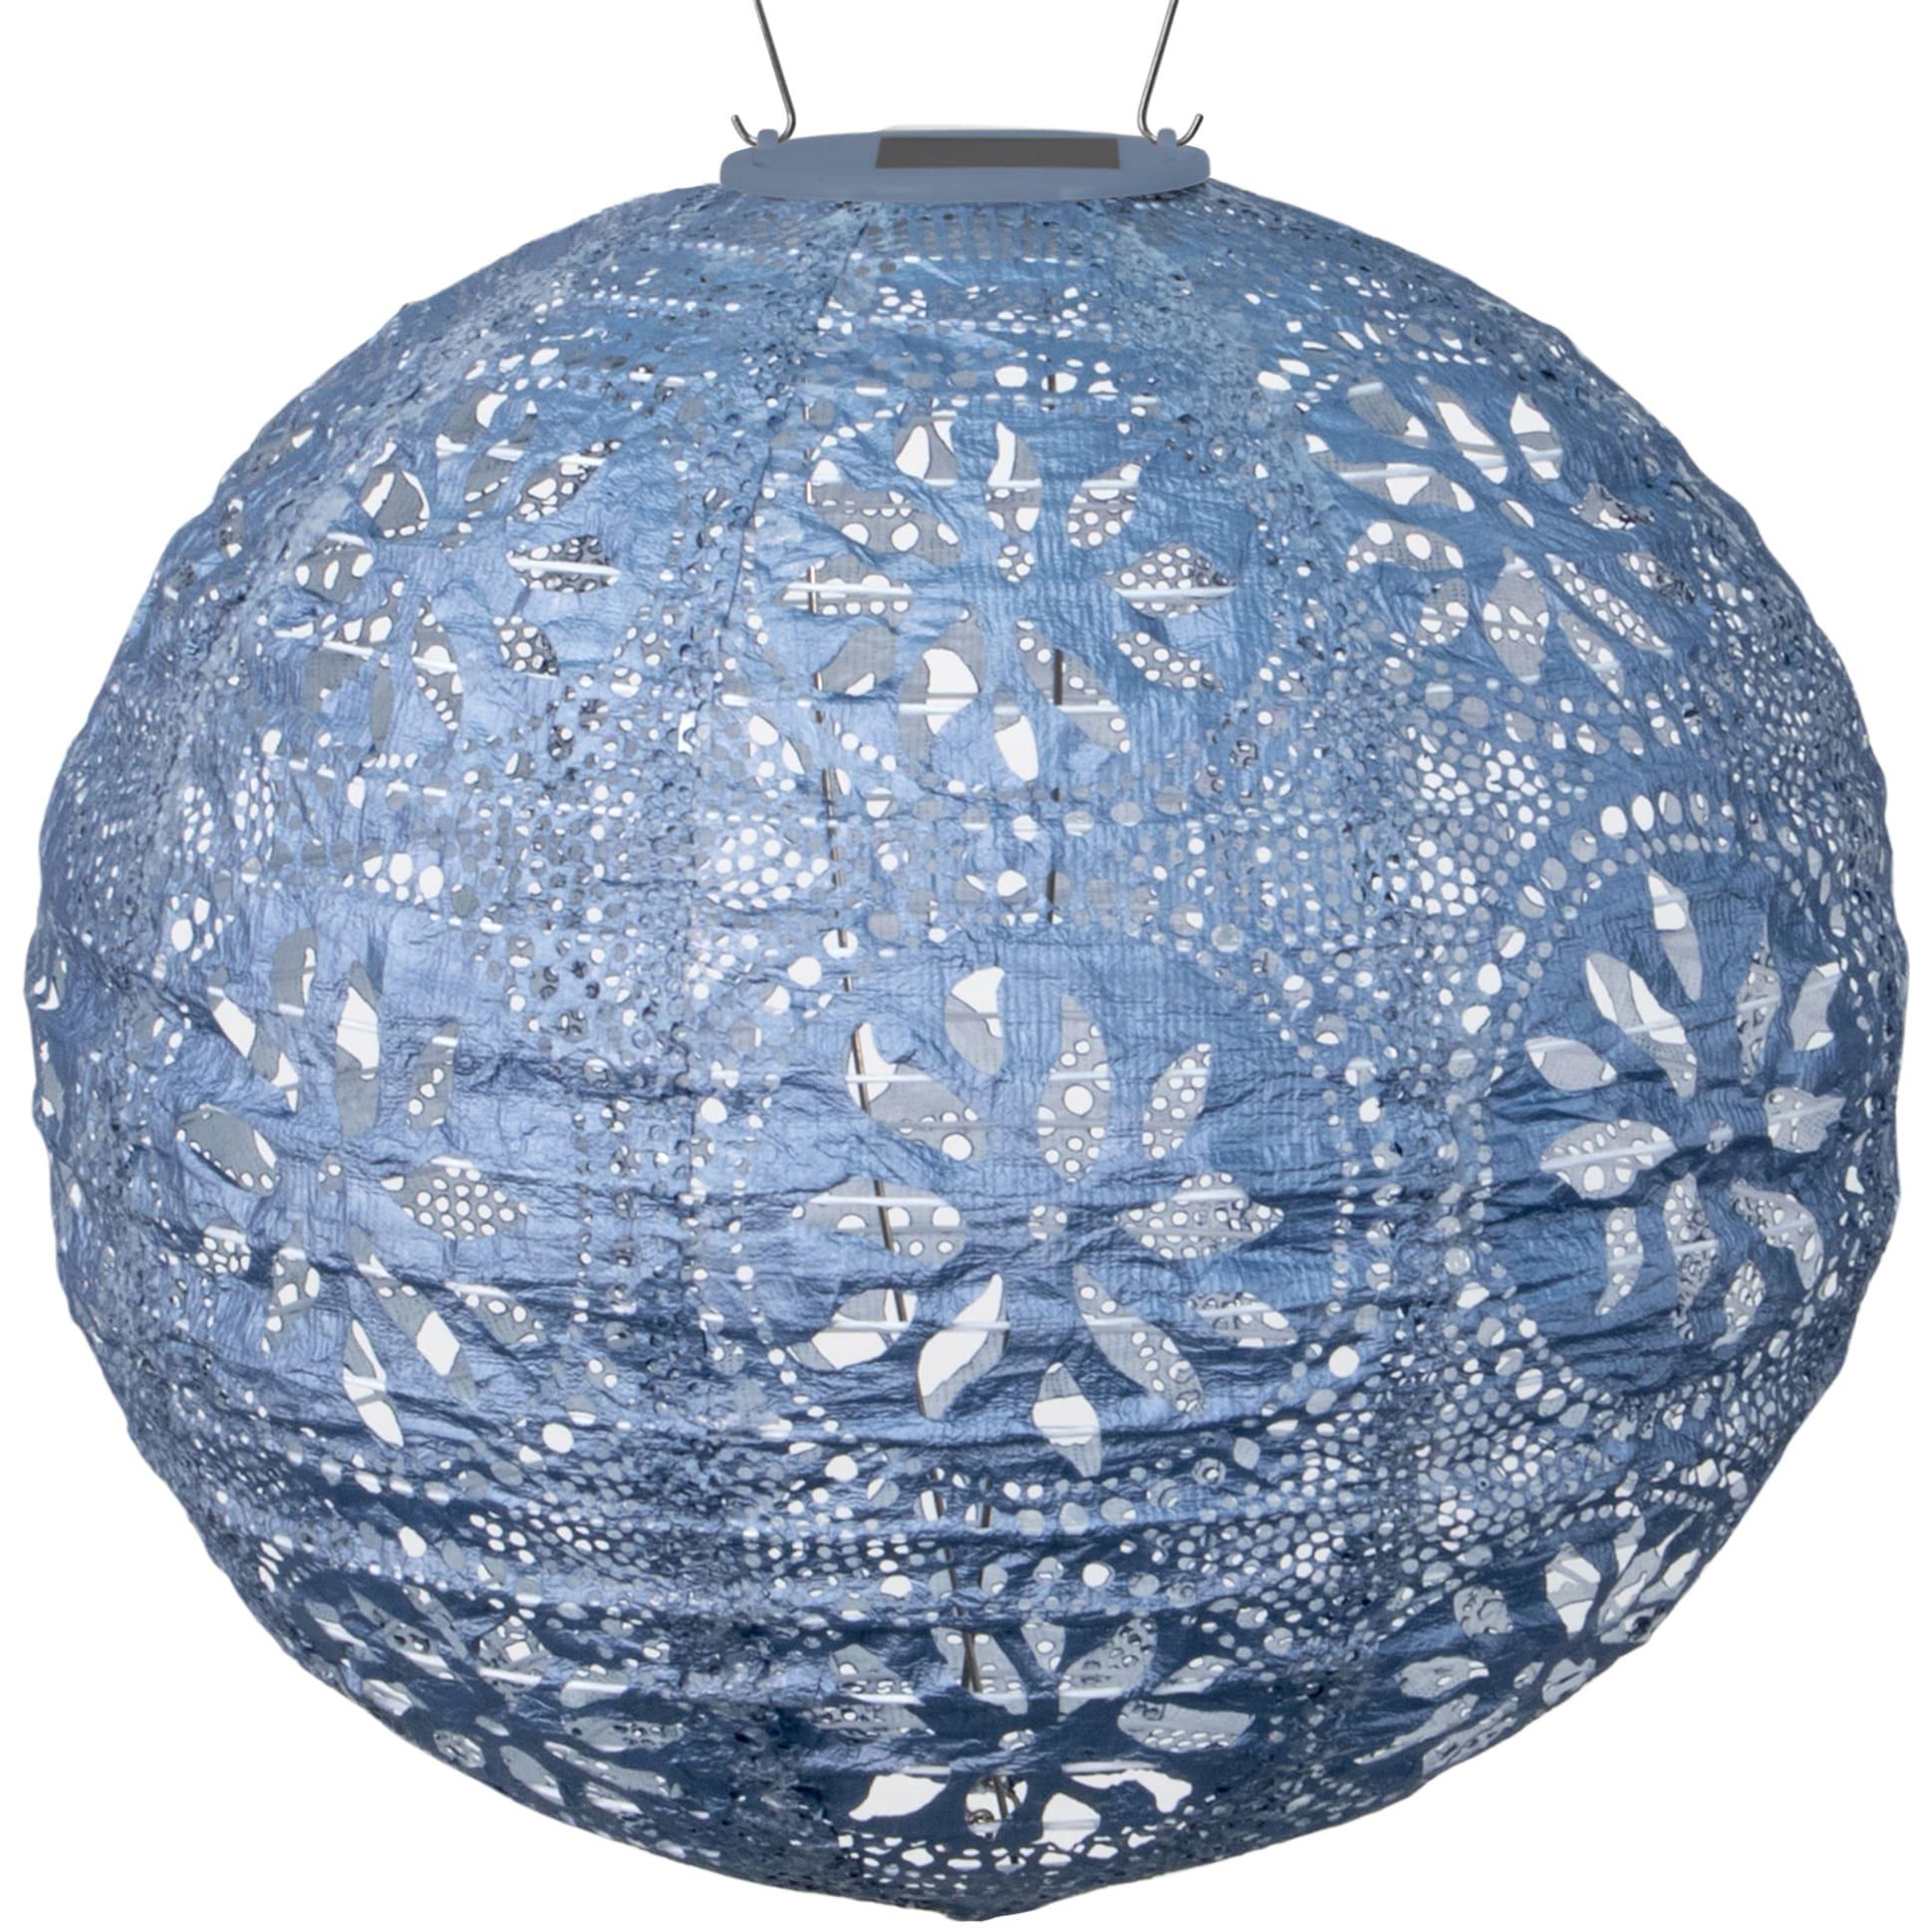 Allsop Soji Stella Boho Globe - Metallic Blue (Plastic)